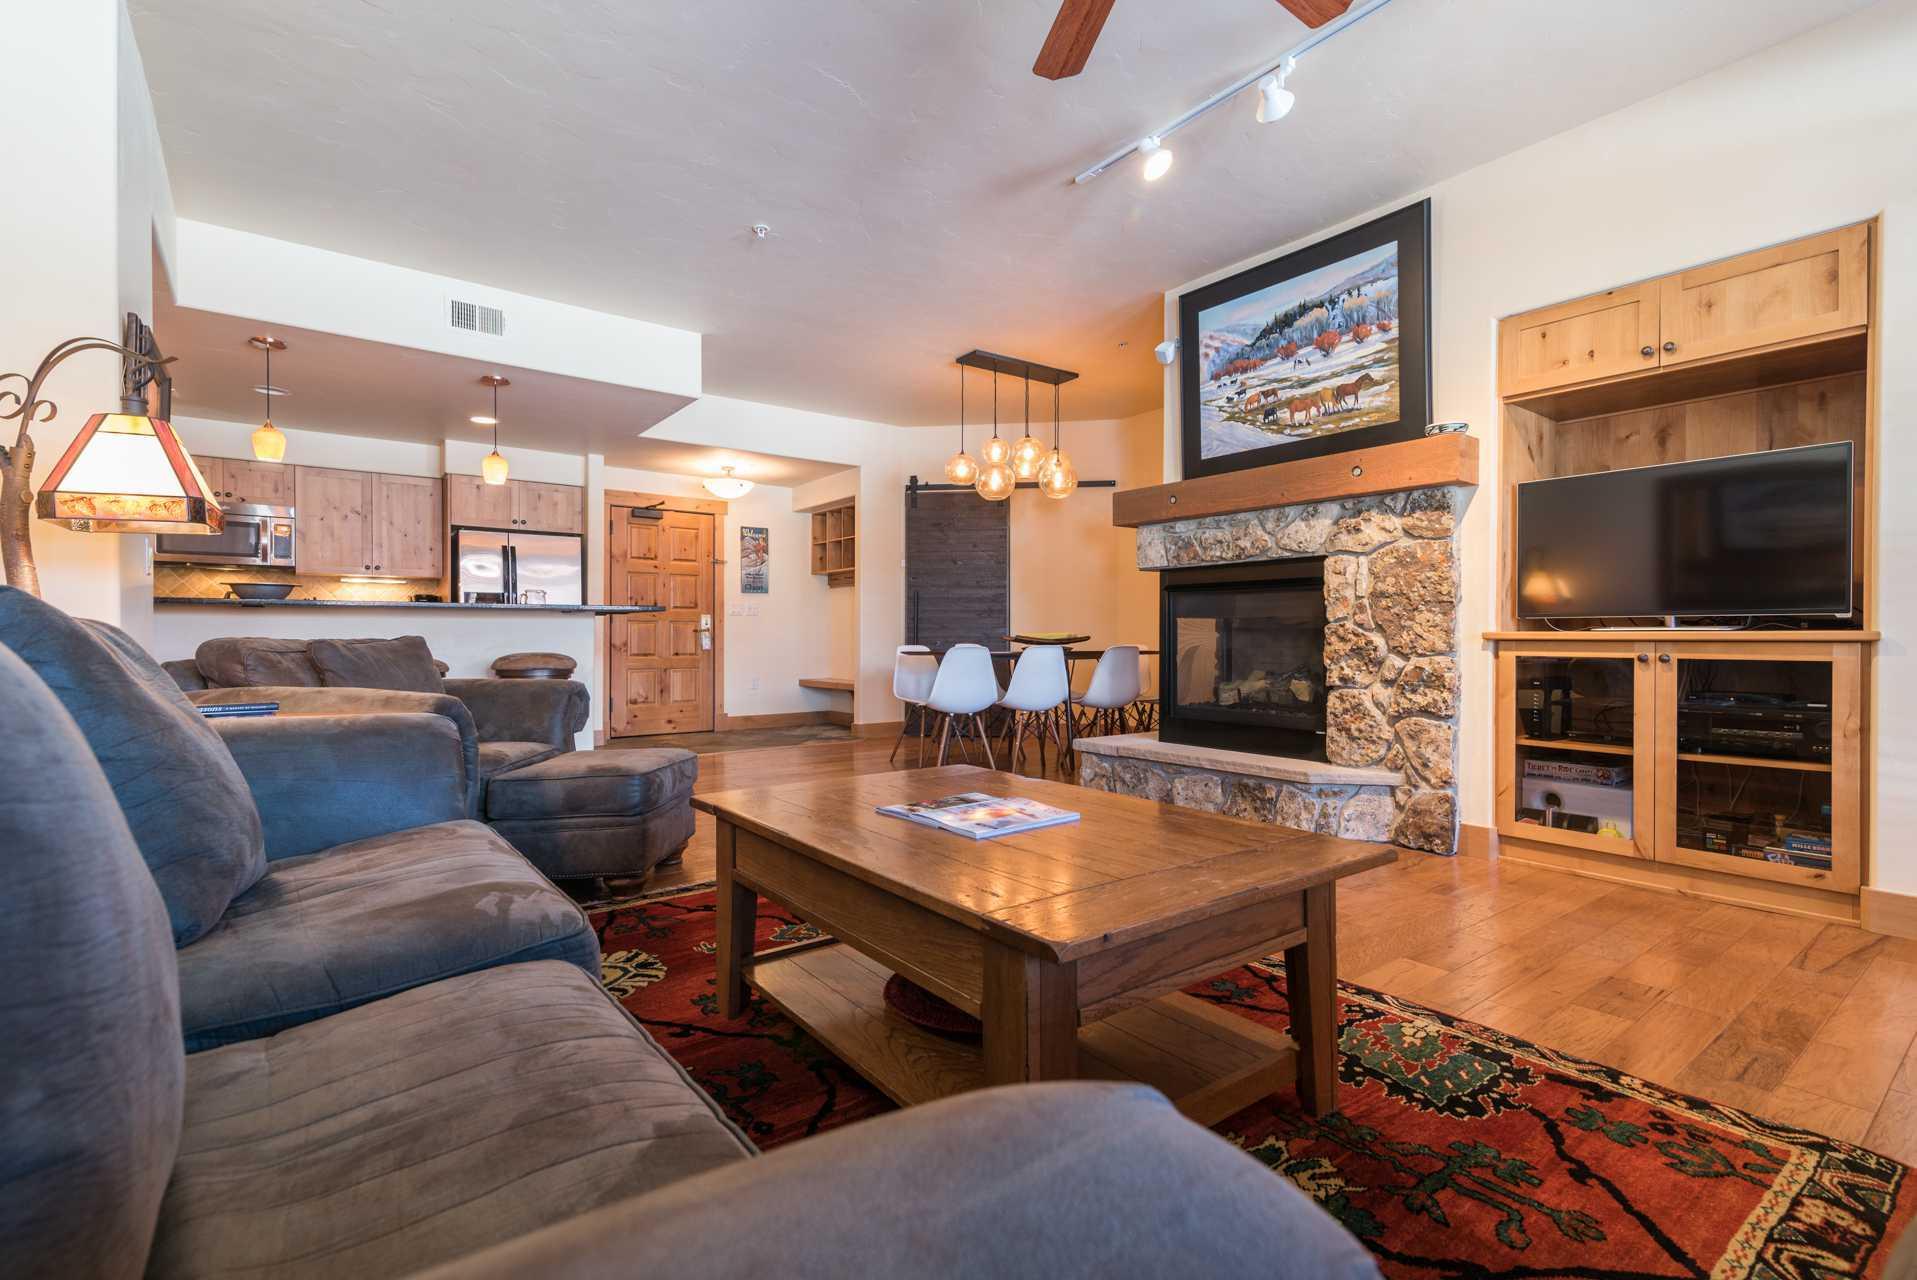 AL4104: Aspen Lodge